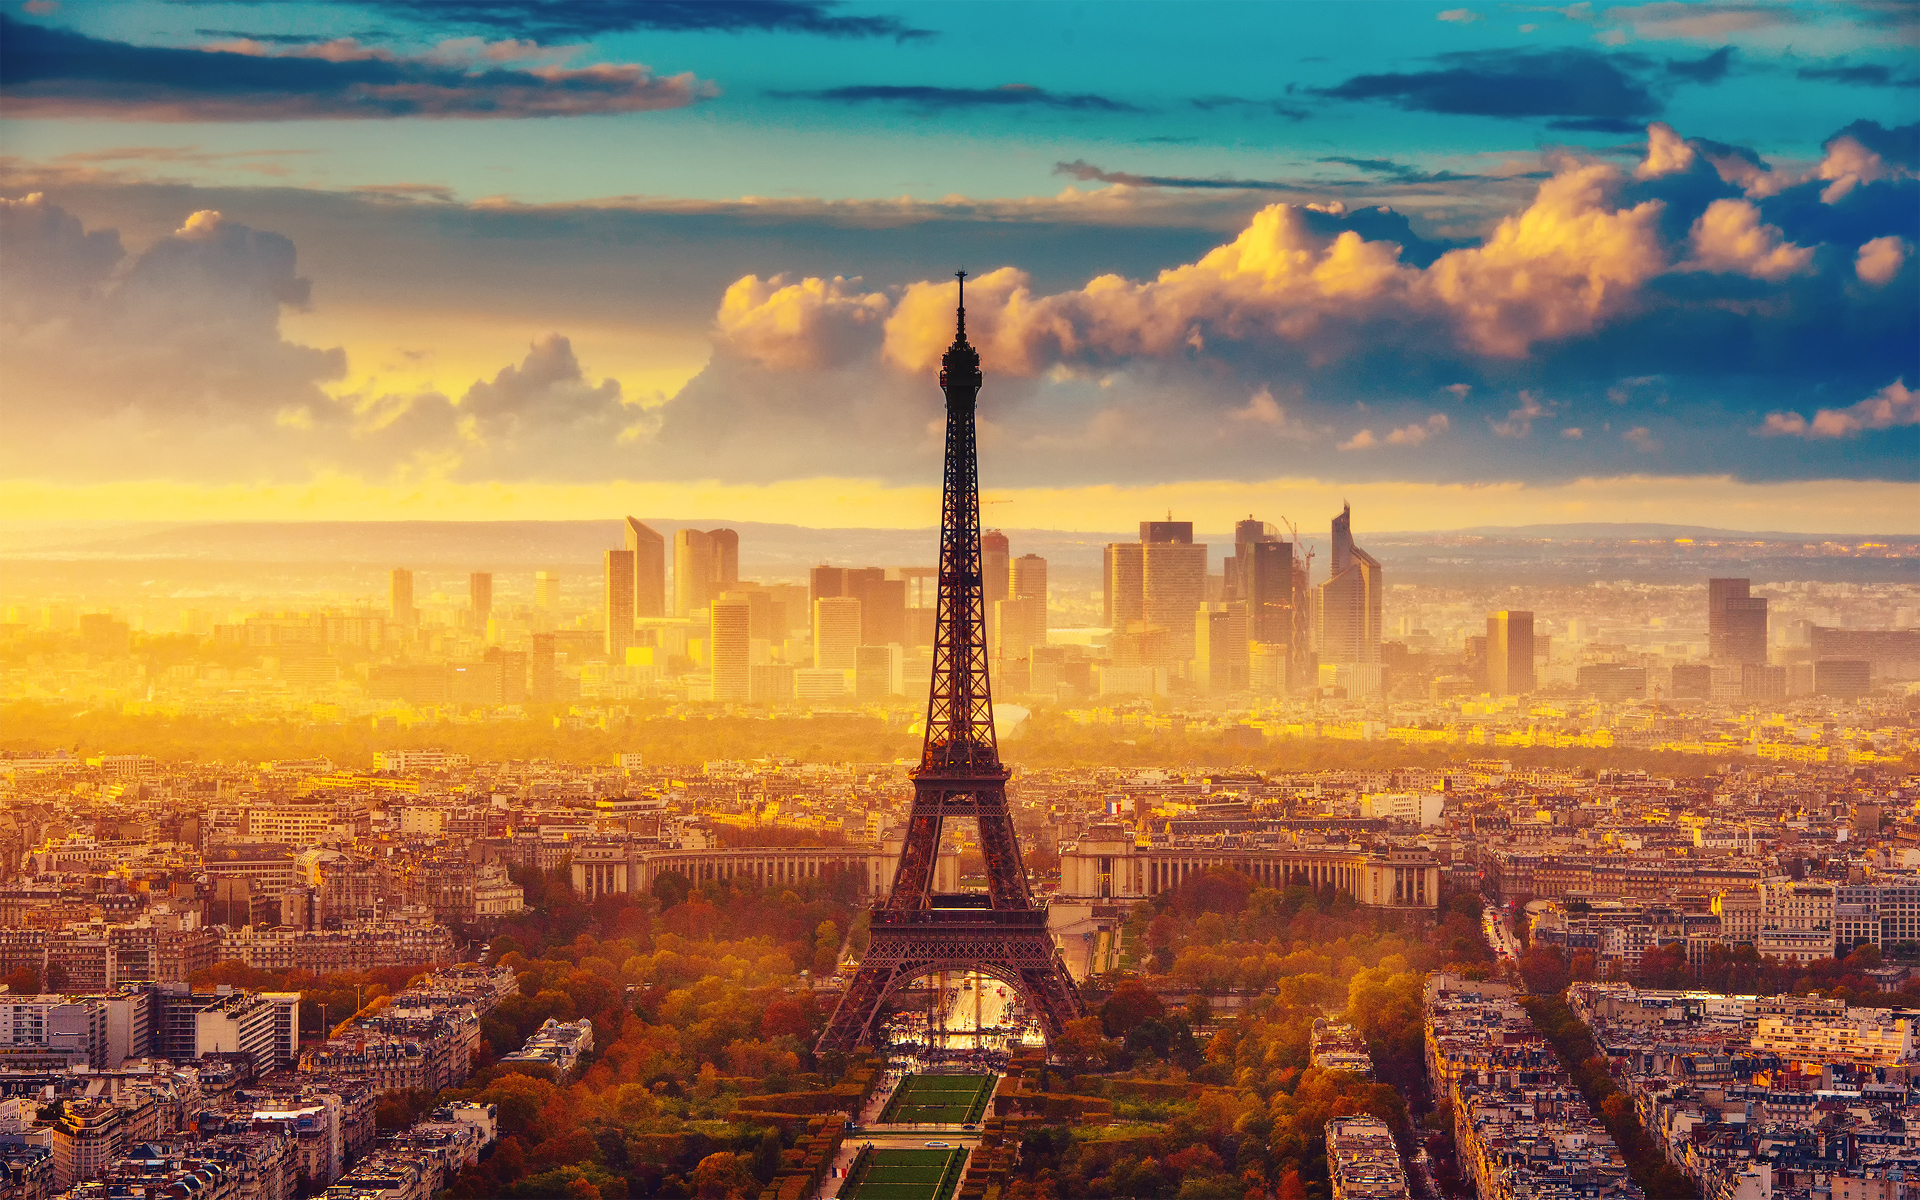 Hd wallpaper paris - France The City Of Paris Eiffel Tower Hd Wallpaper